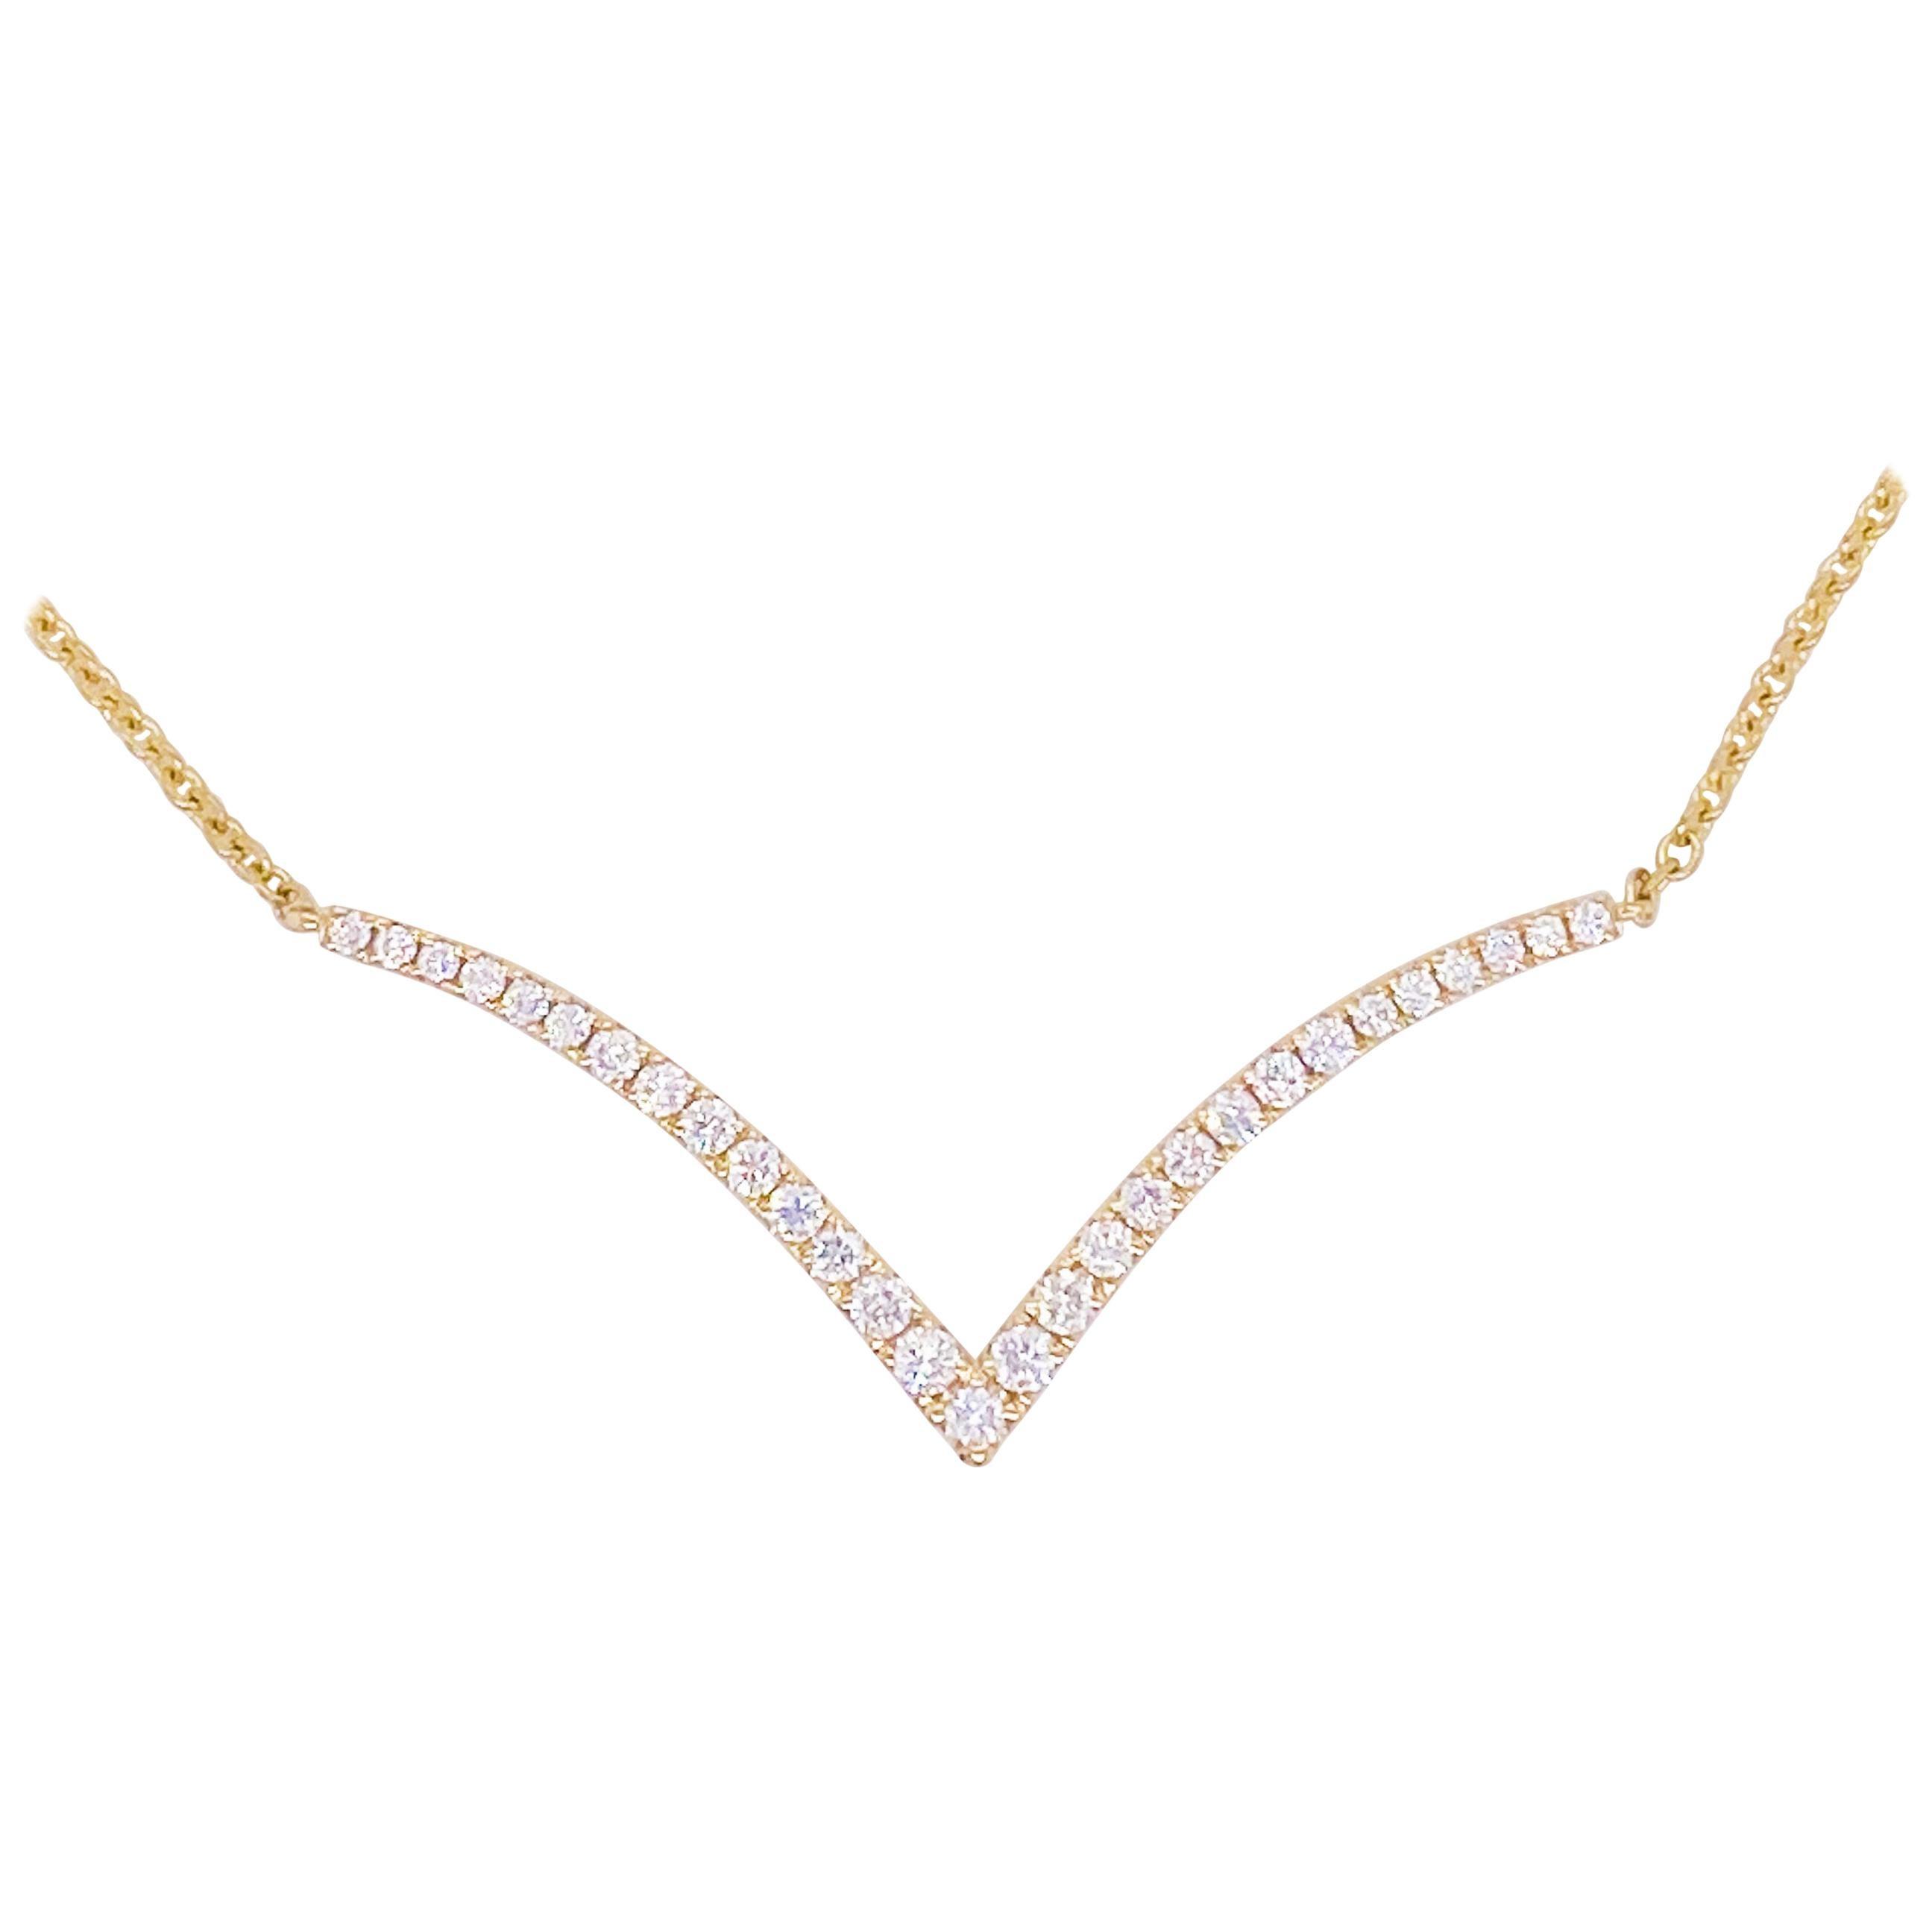 Diamond V Necklace 14 Karat Yellow Gold, Wedding Necklace, Fashion, Can Add Drop